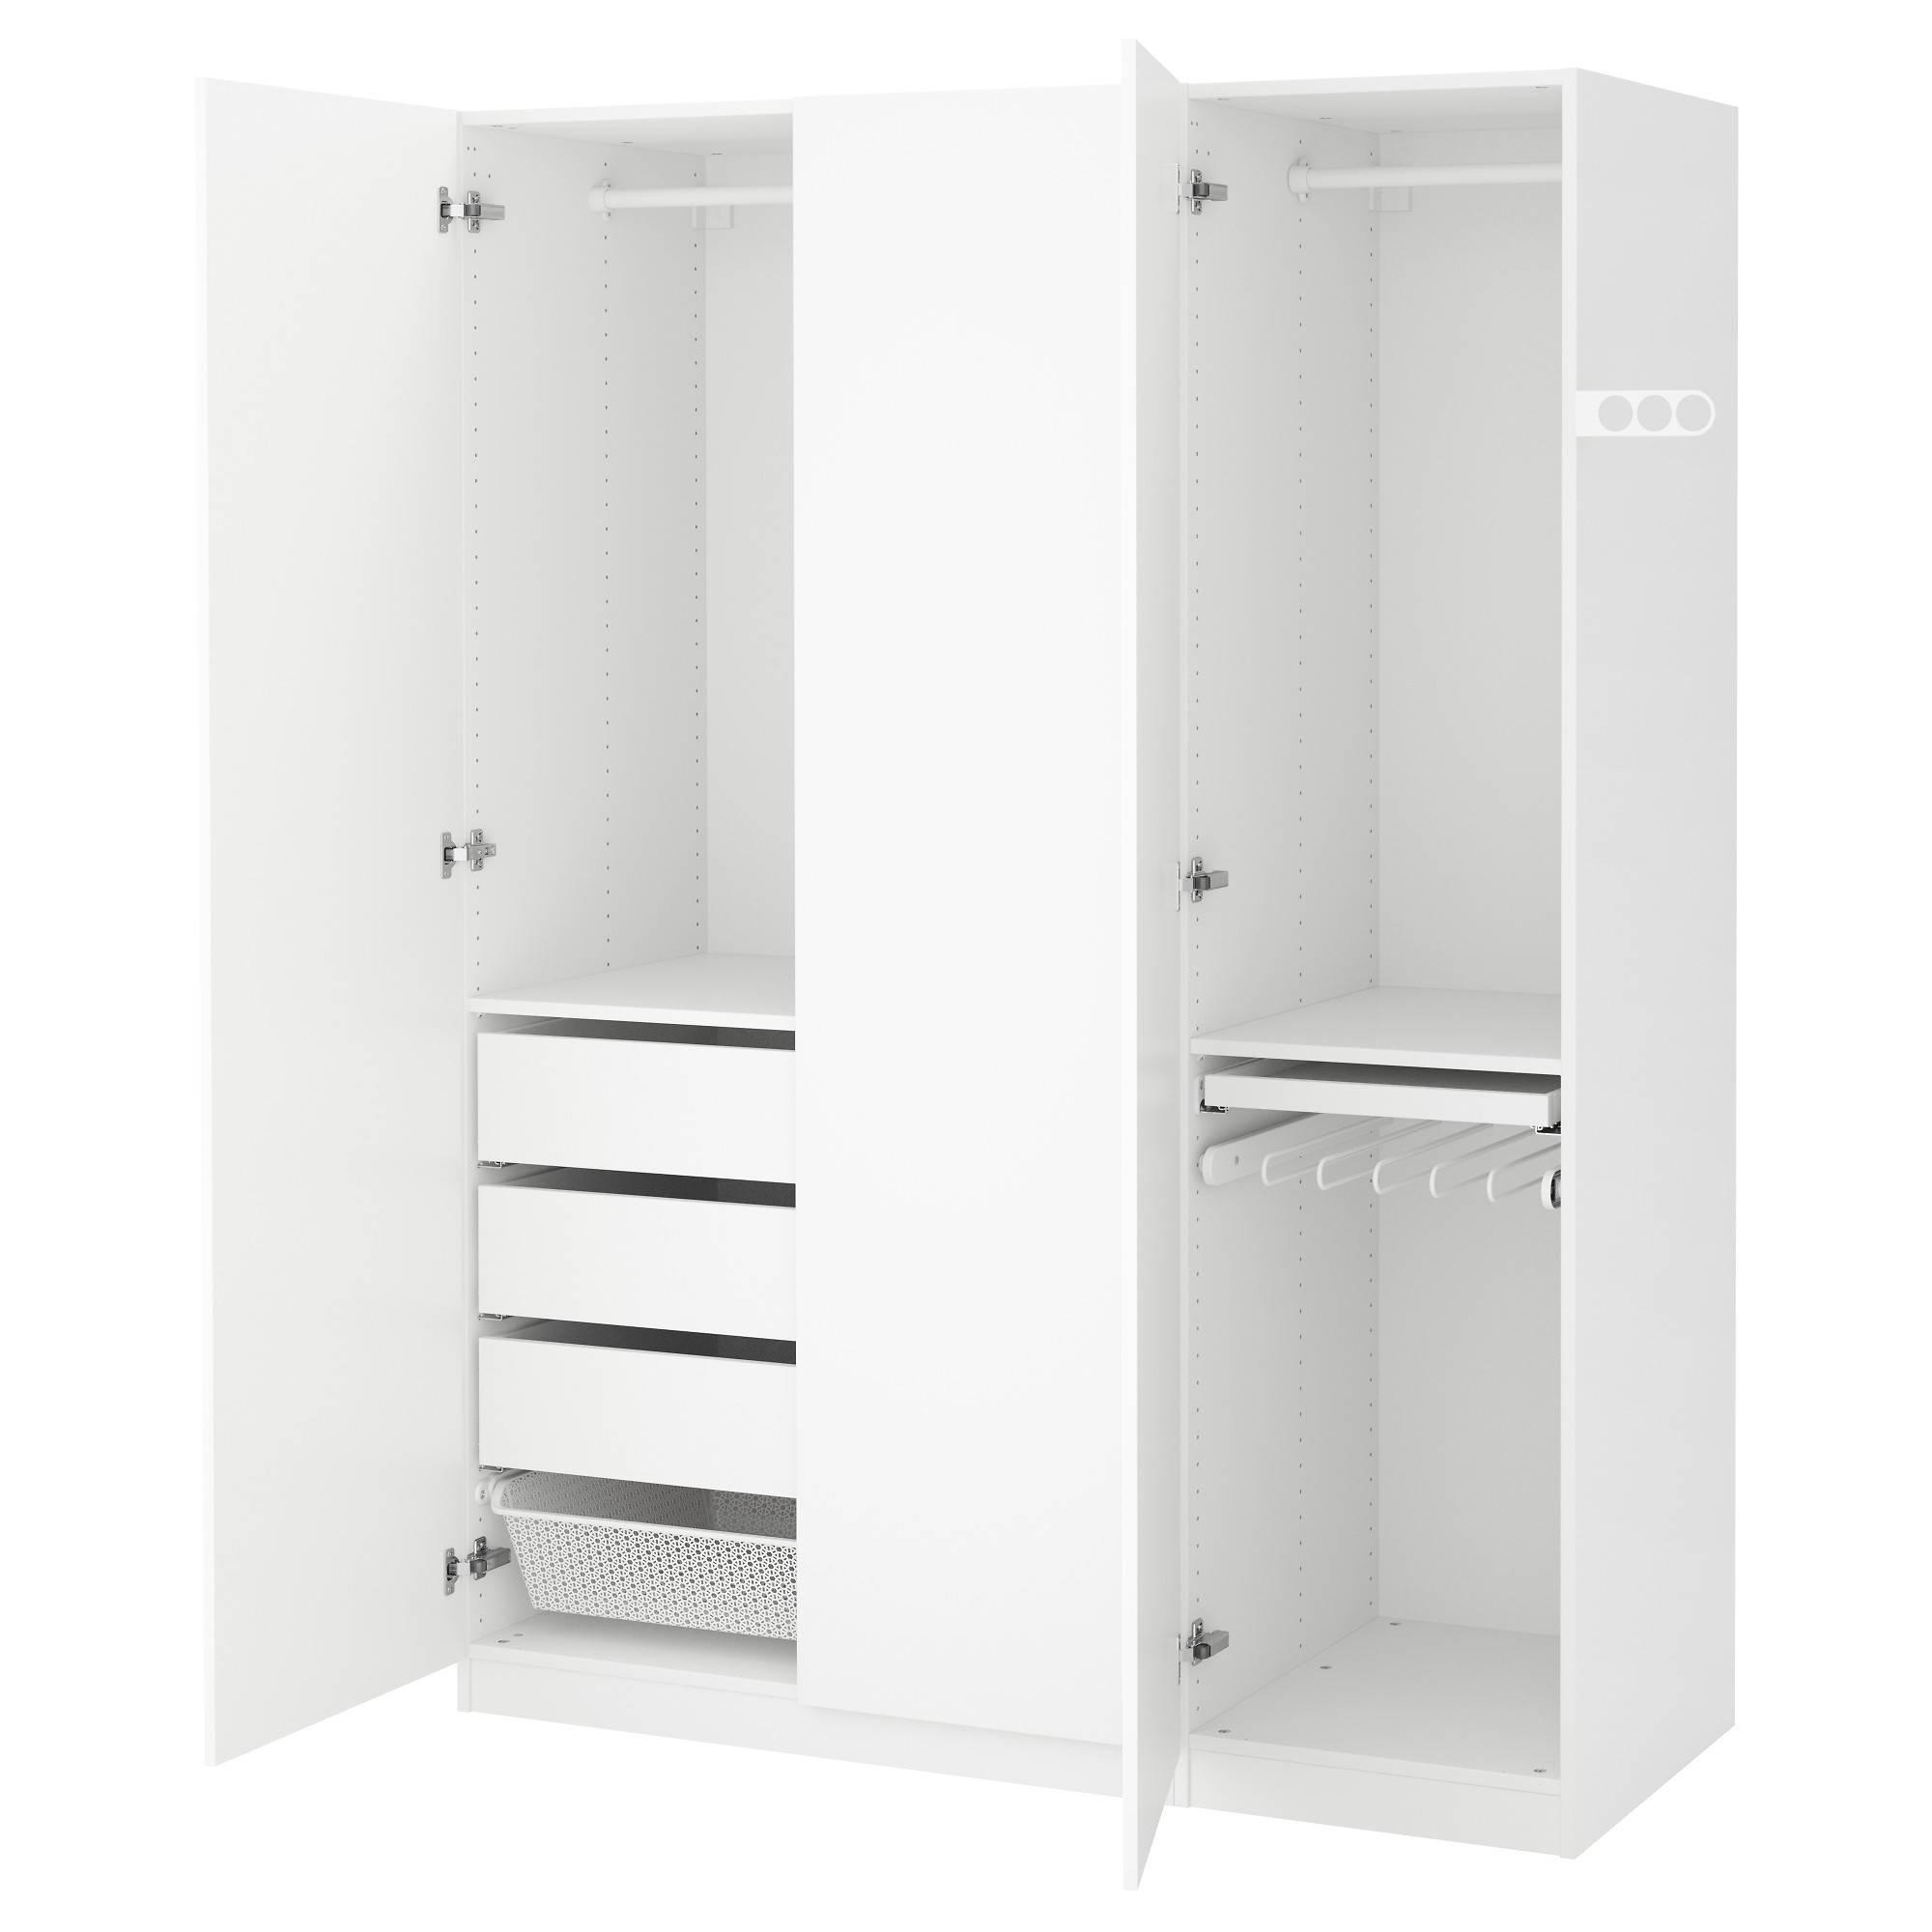 Wardrobes | Ikea with regard to Single White Wardrobes (Image 14 of 15)